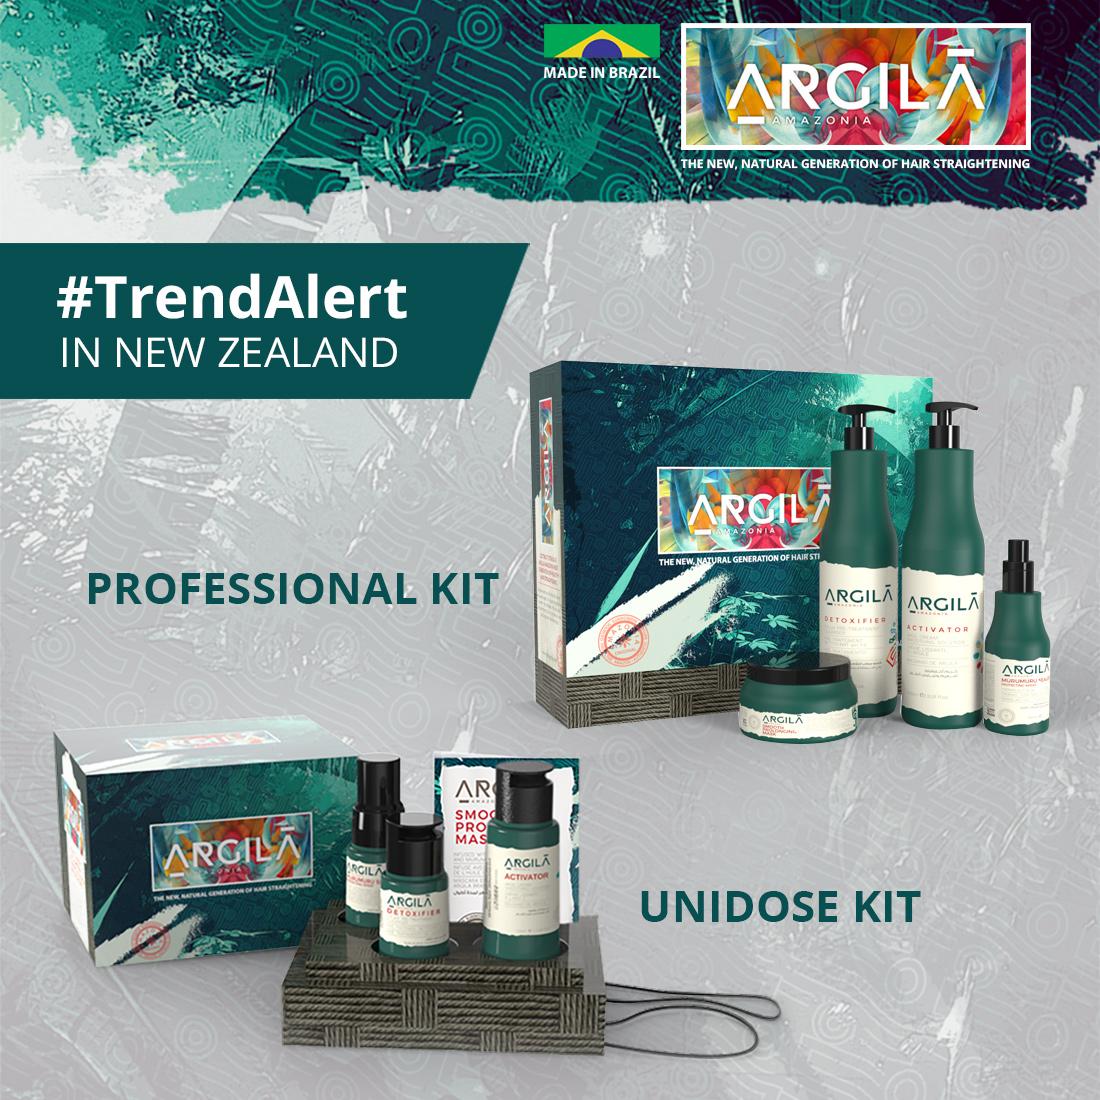 Media Kit Argila Amazônia 11.jpg